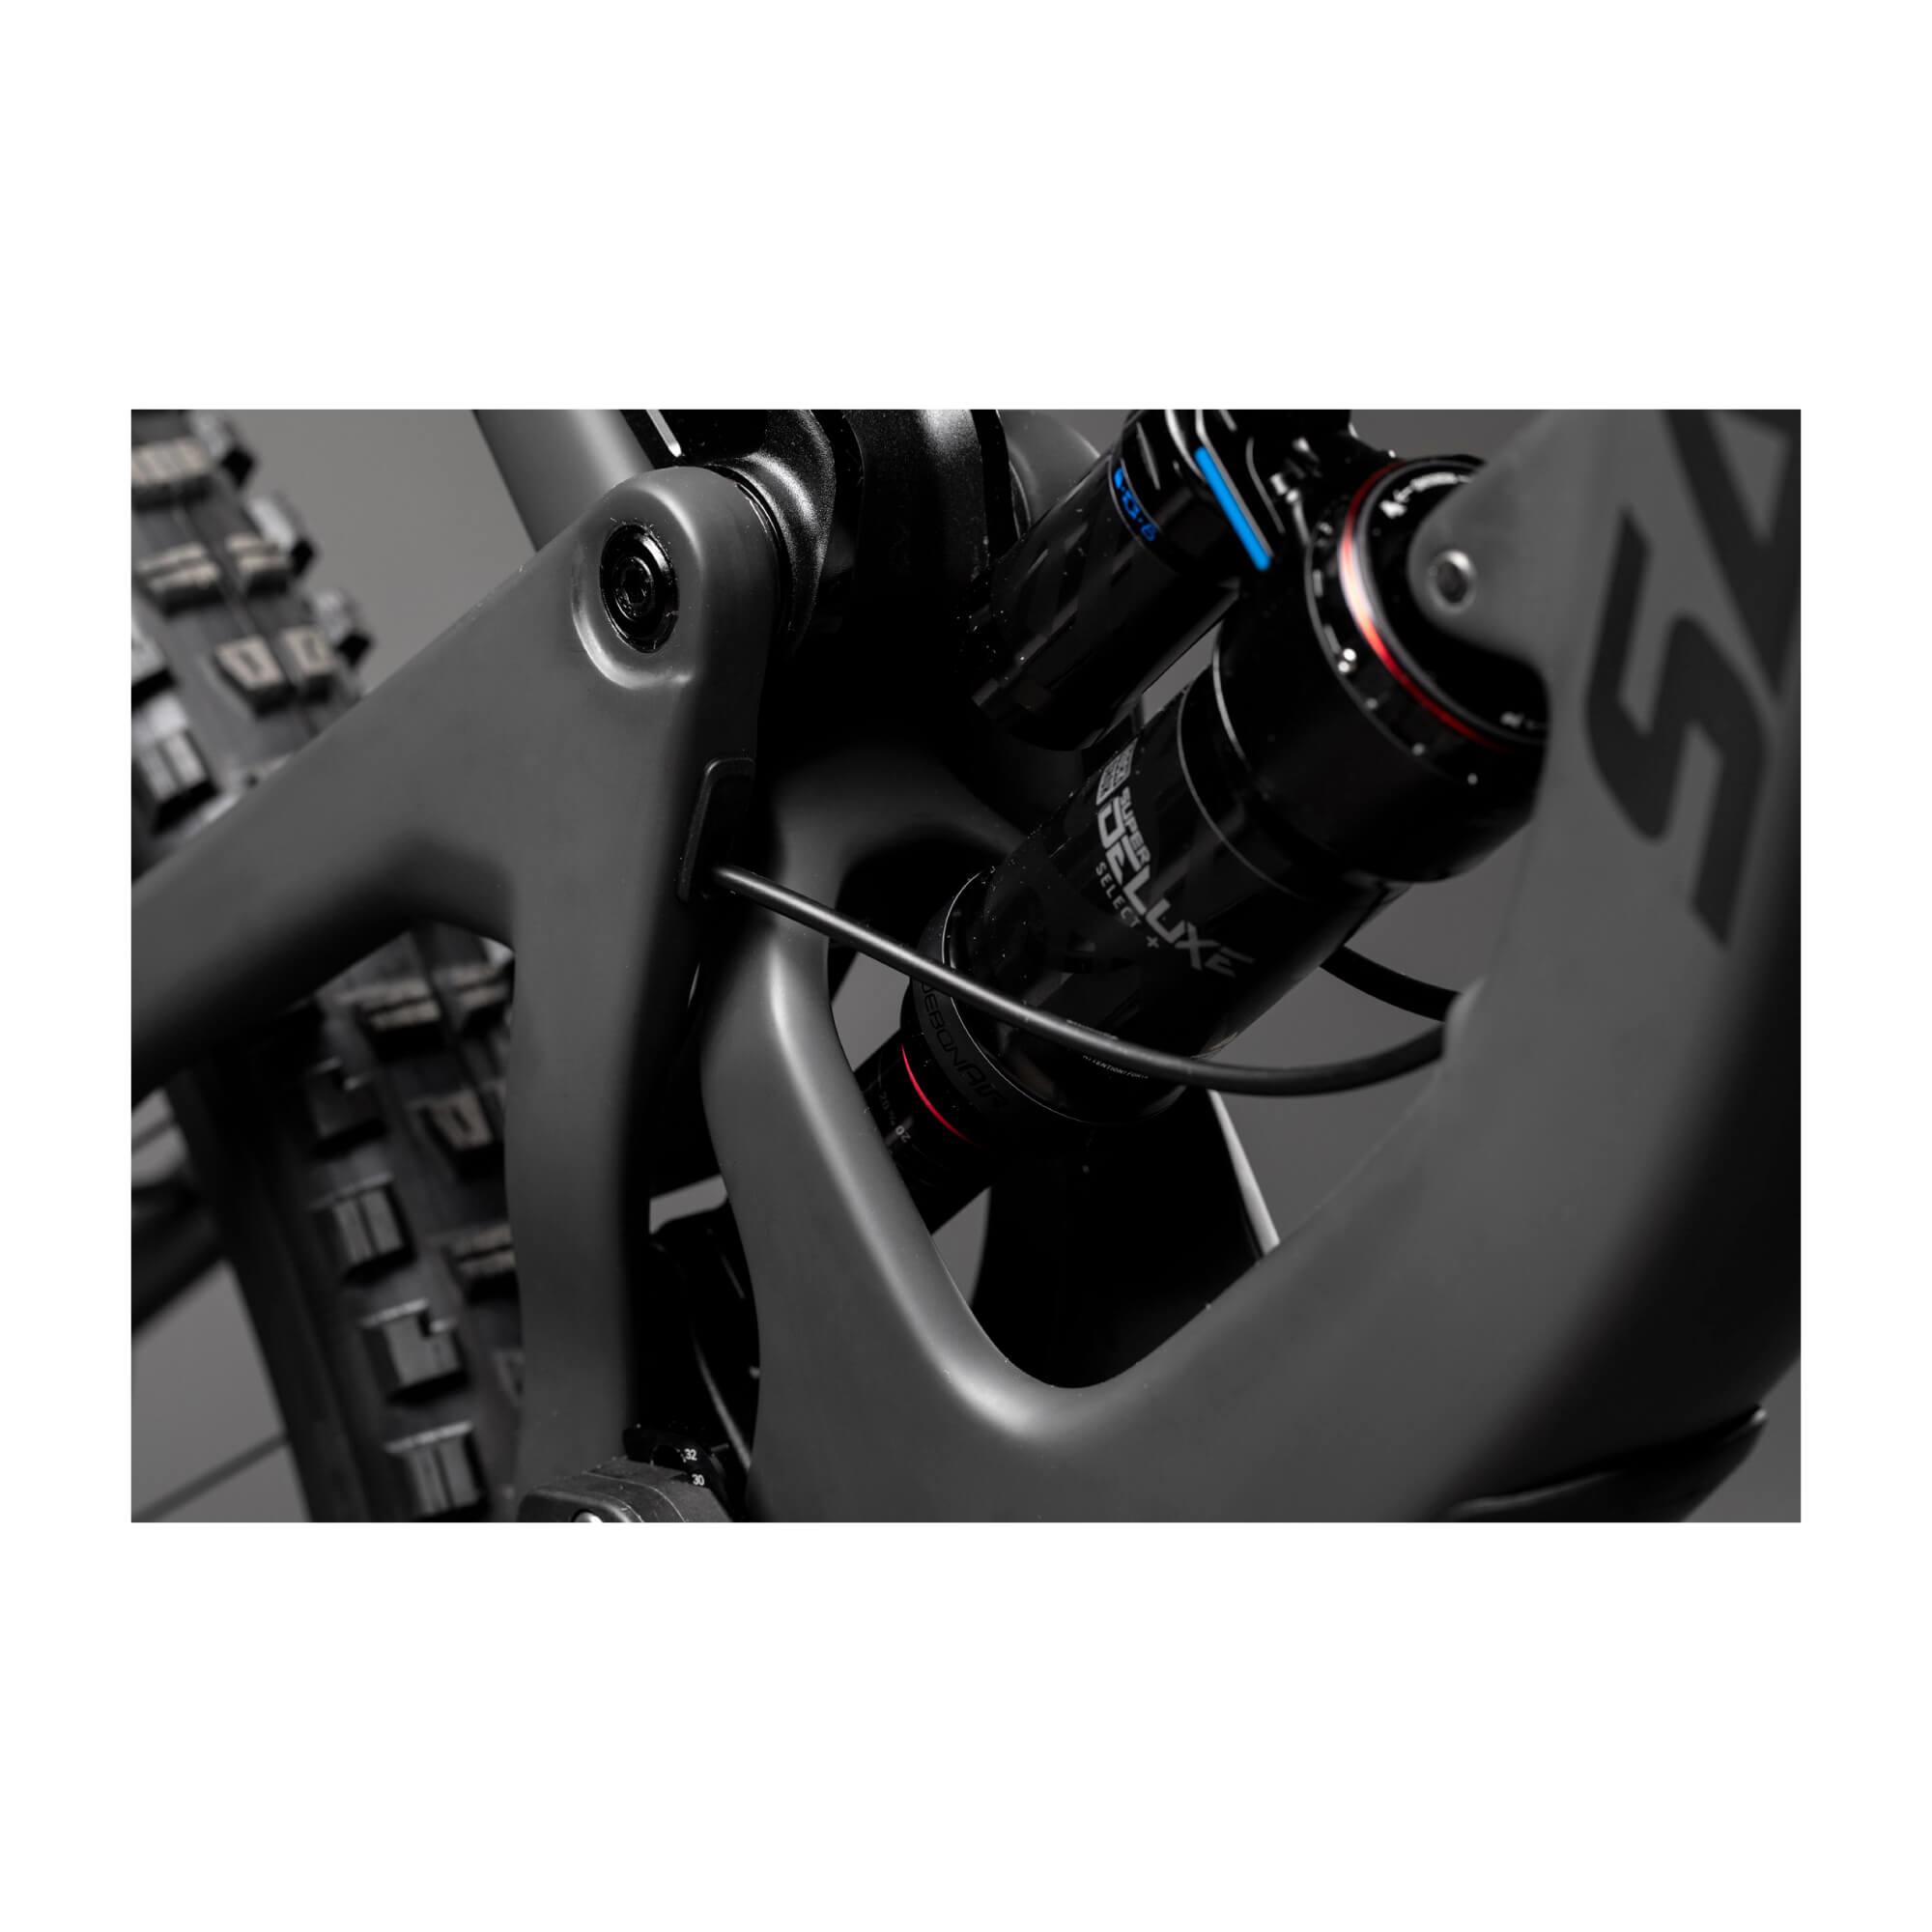 Megatower C 29 S GX Eagle Fox 36 Performance 160 Coil  2020-5